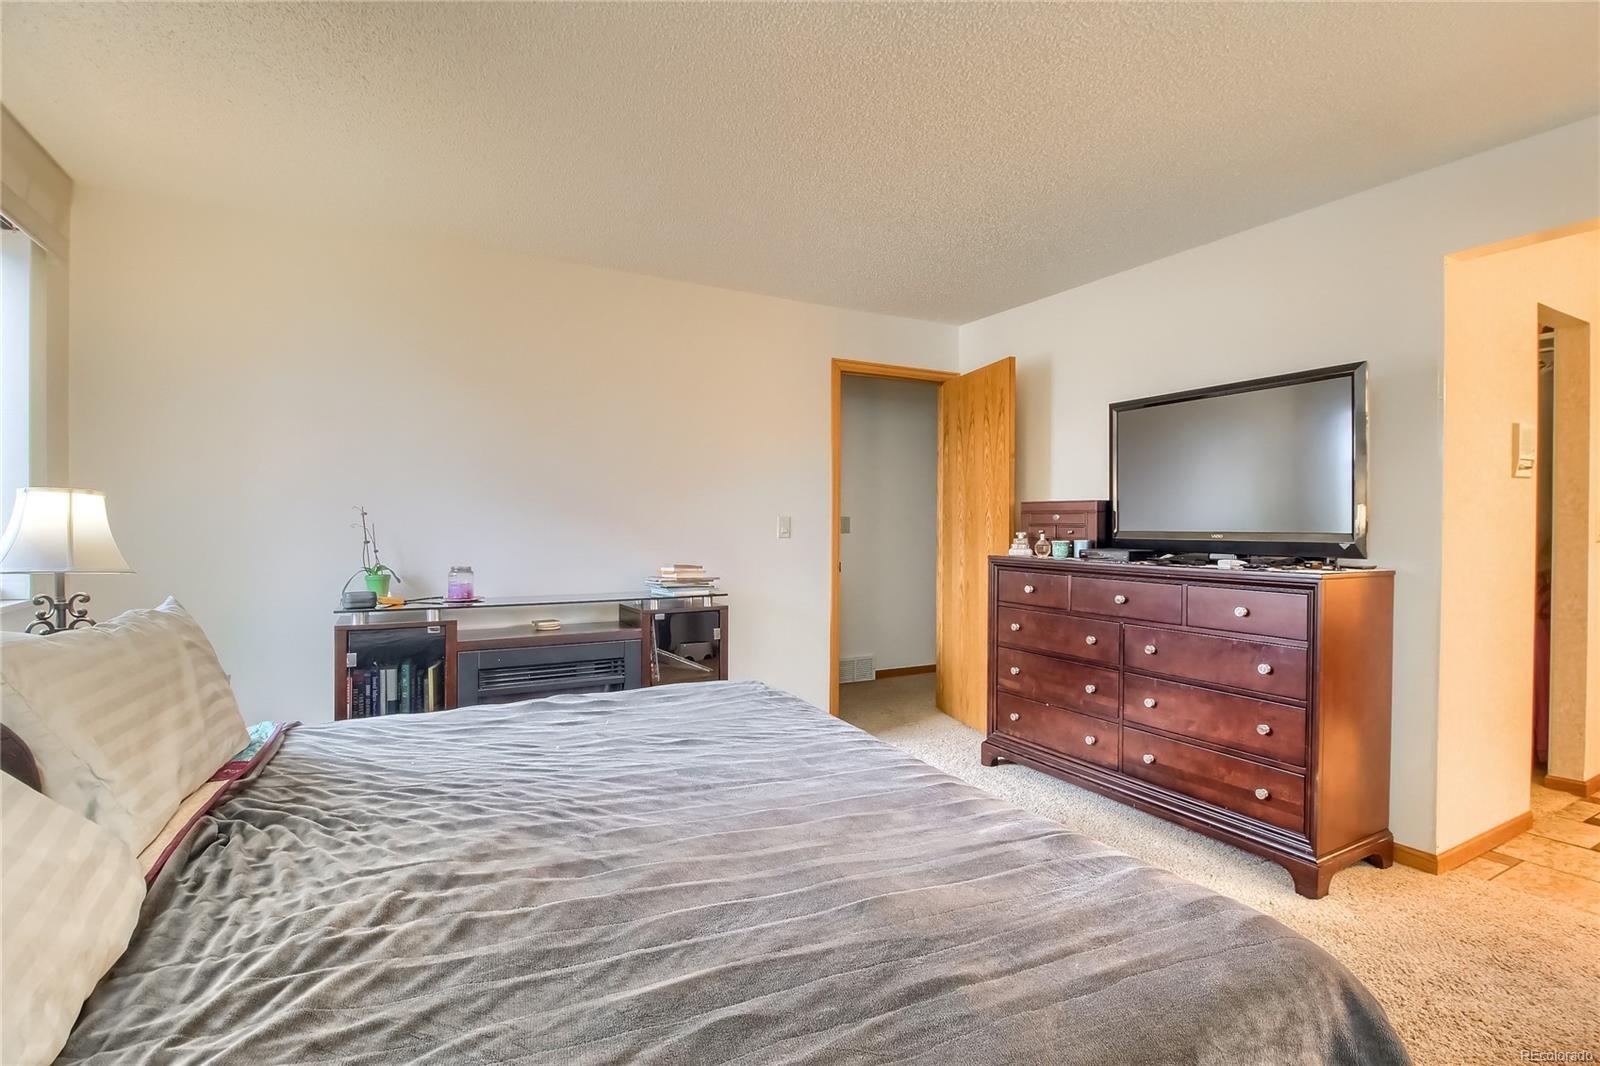 MLS# 3073628 - 1 - 10945  W Montana Place, Lakewood, CO 80232